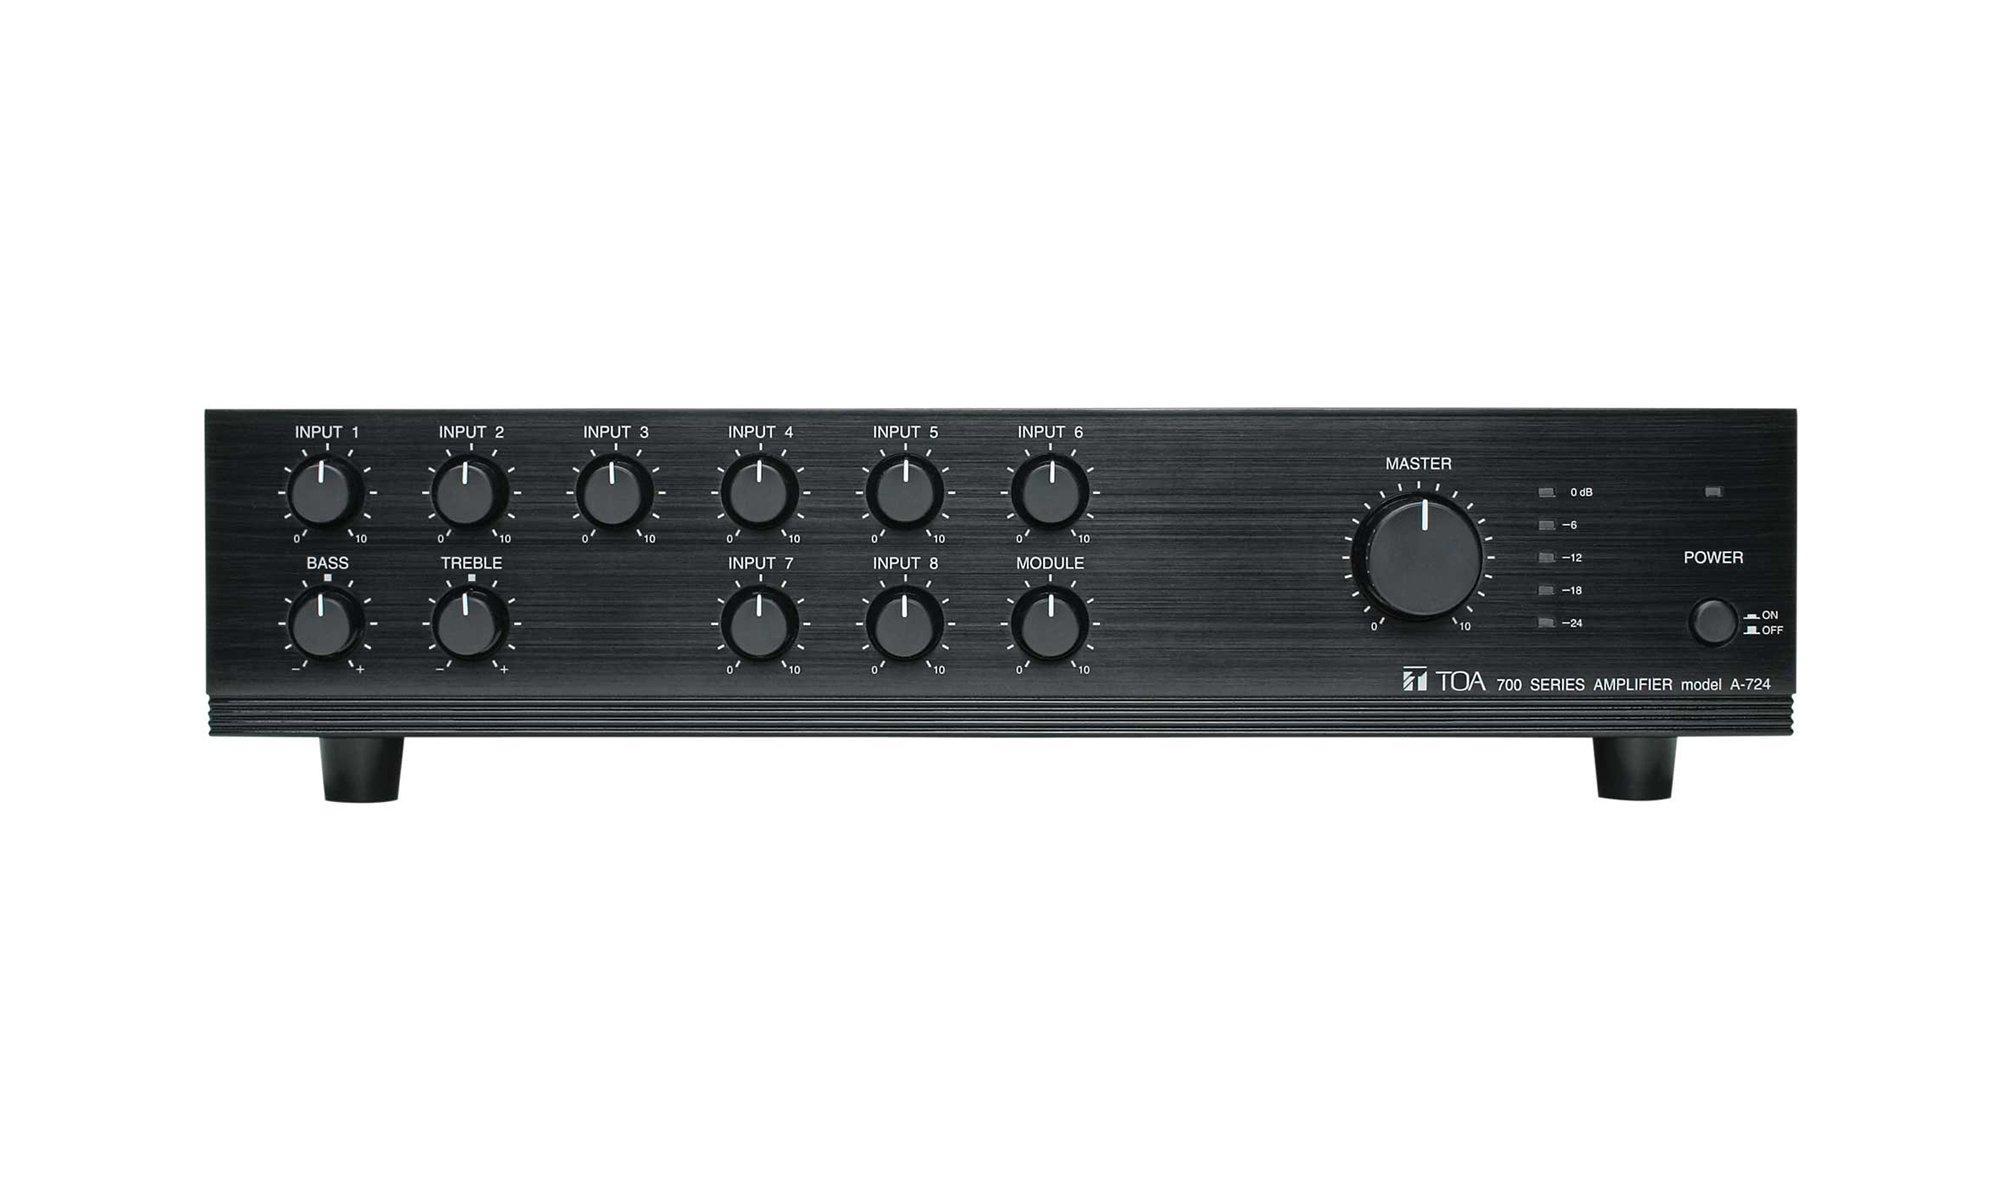 240W Mixer / Amplifier